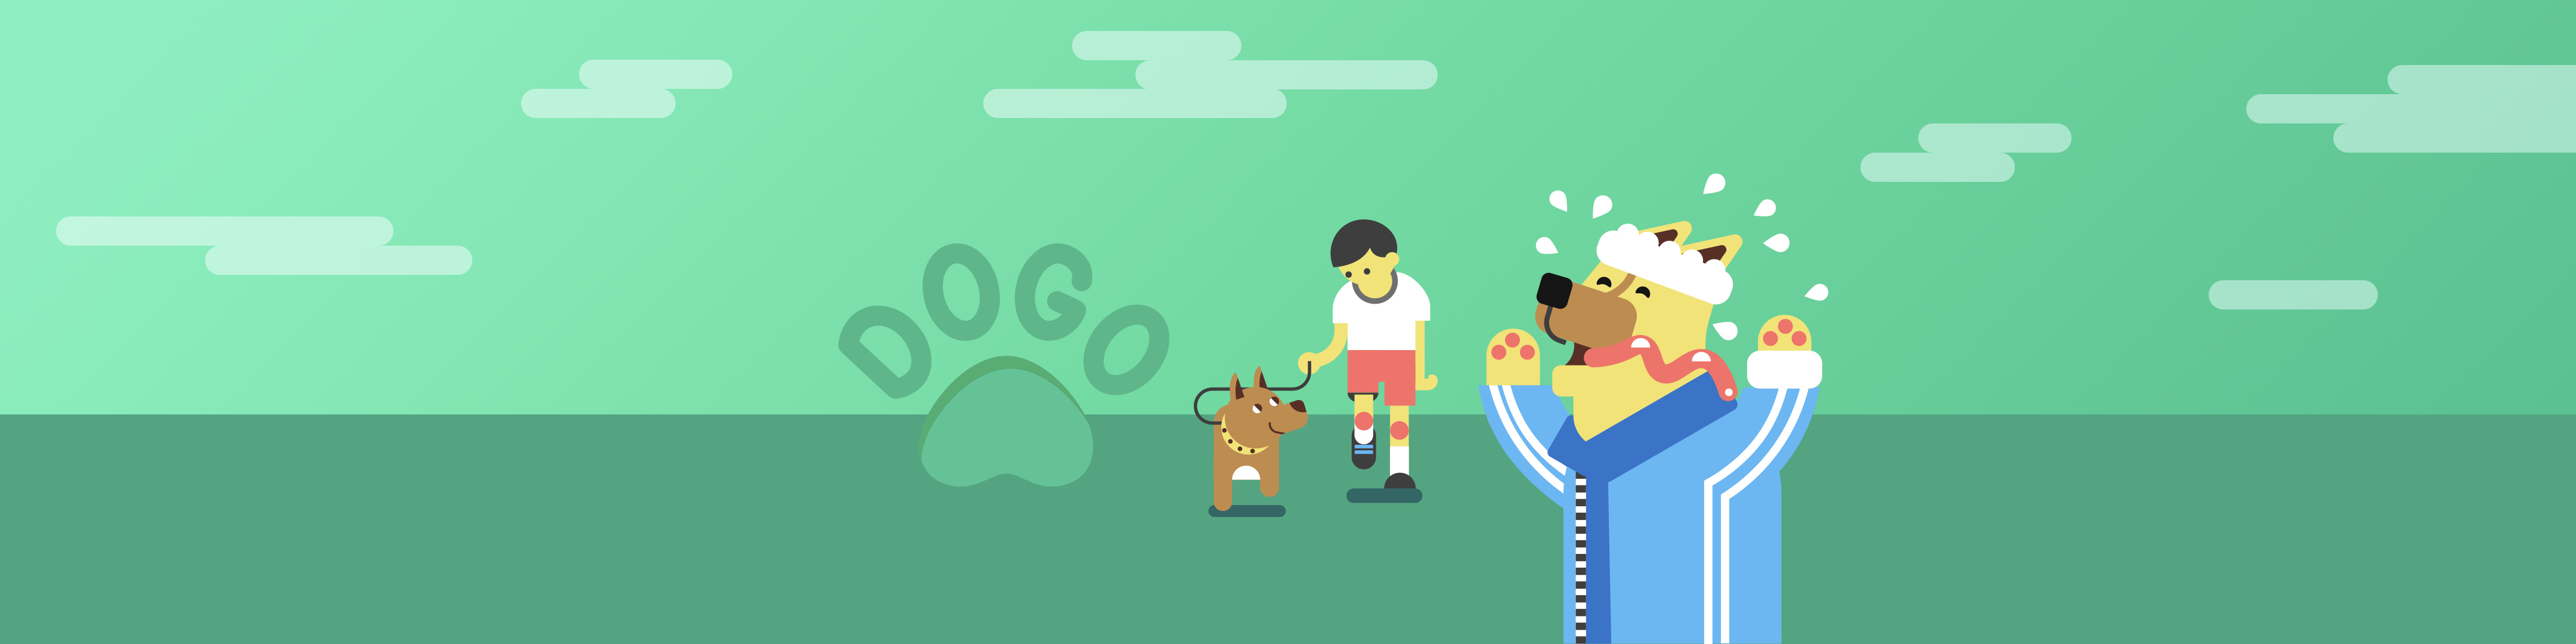 Dogo - Dog Training & Clicker - Revenue & Download estimates